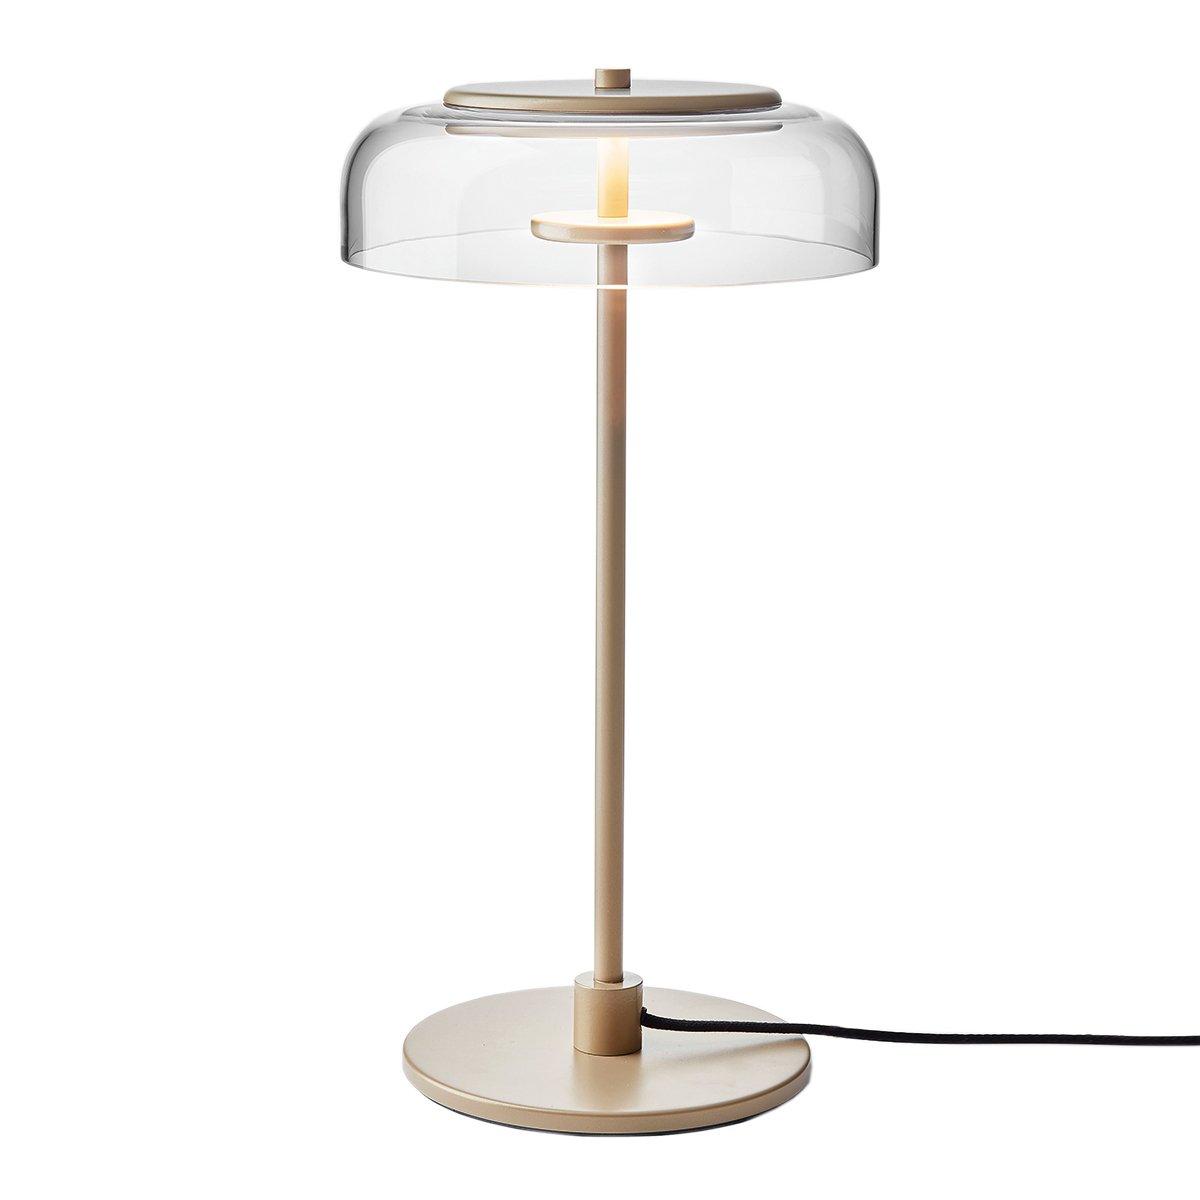 Nuura Blossi Tafellamp - Nordic Gold - Clear